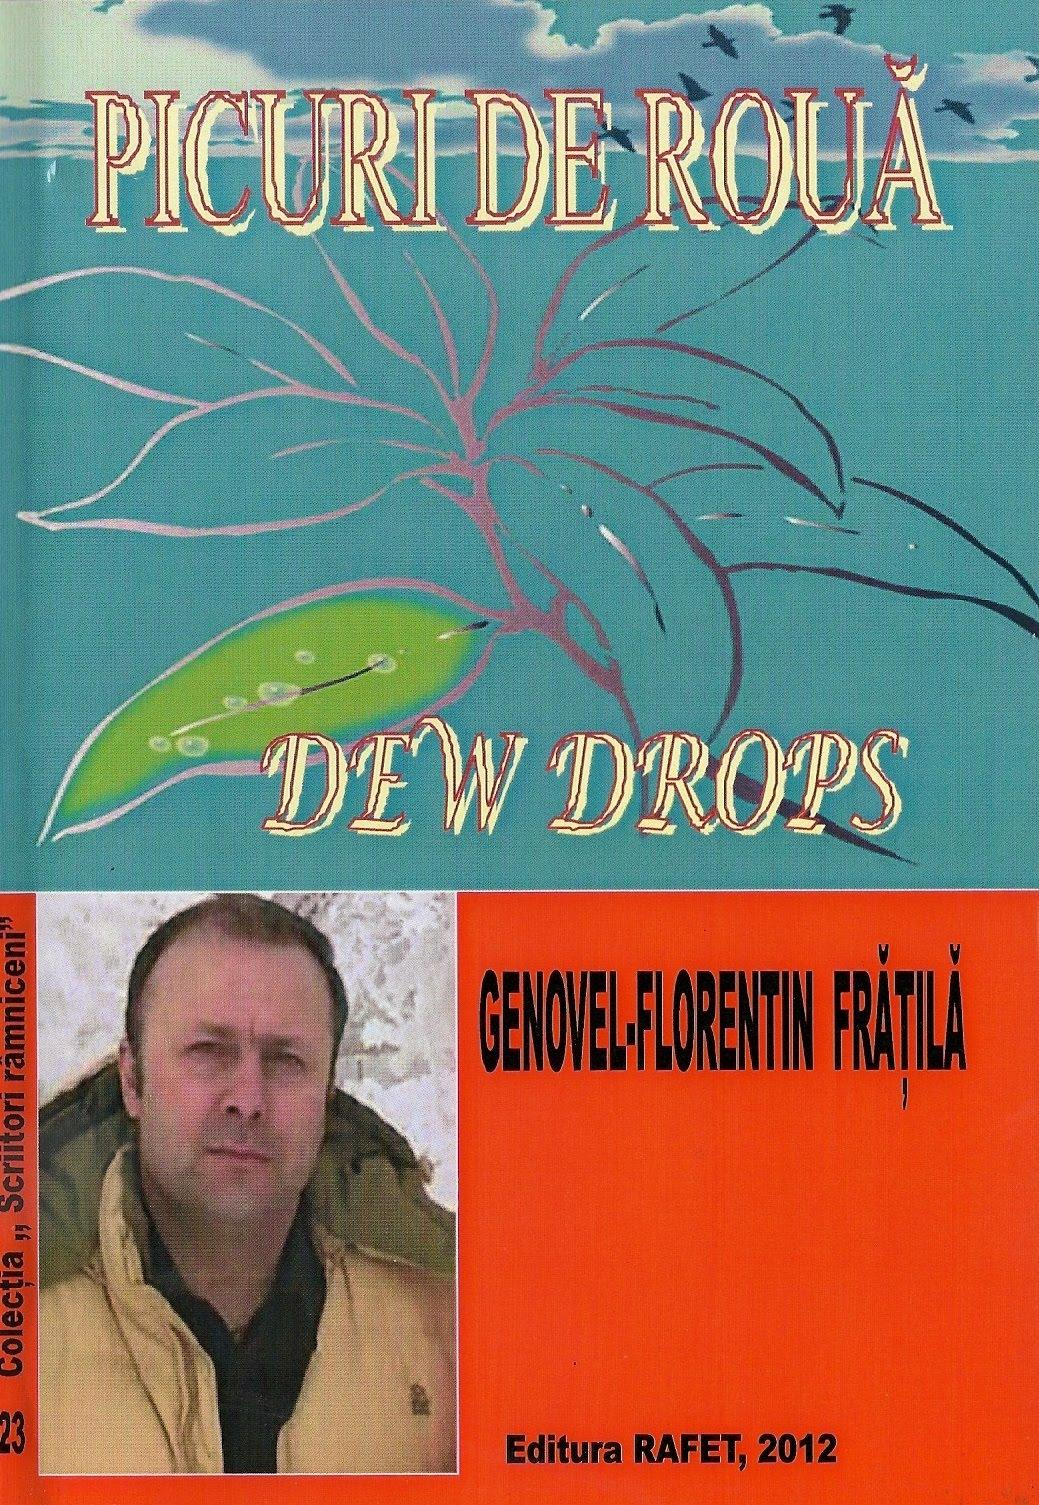 Genovel Florentin Frăţilă - Dew Drops